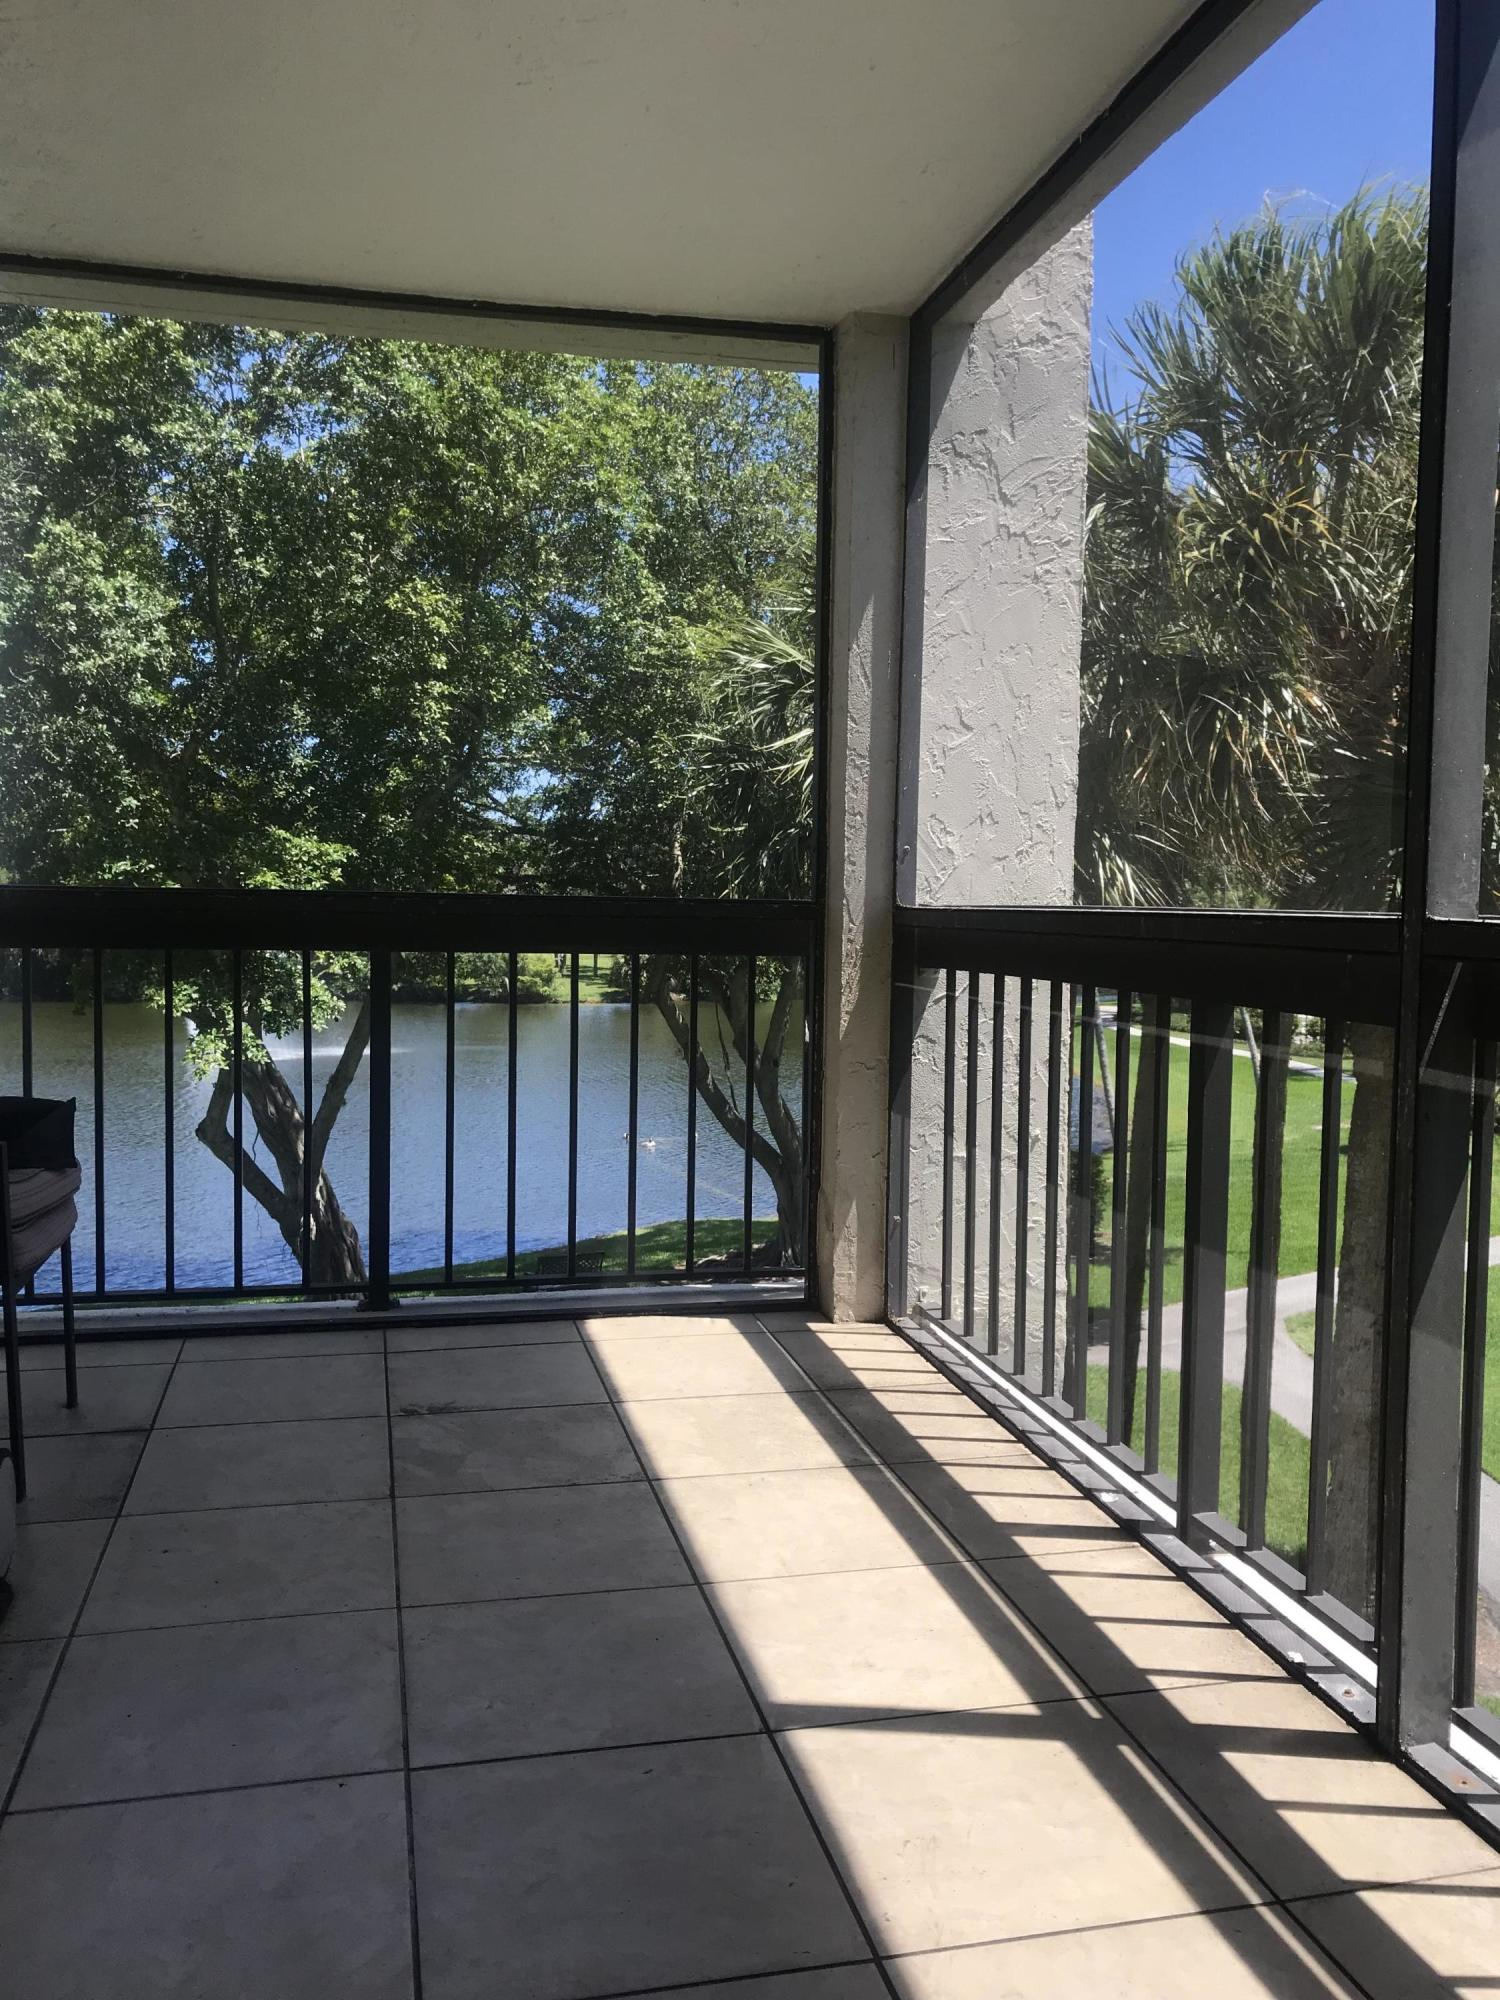 950 Lavers Circle, Delray Beach, Florida 33444, 2 Bedrooms Bedrooms, ,2 BathroomsBathrooms,Rental,For Rent,Lavers,RX-10630147